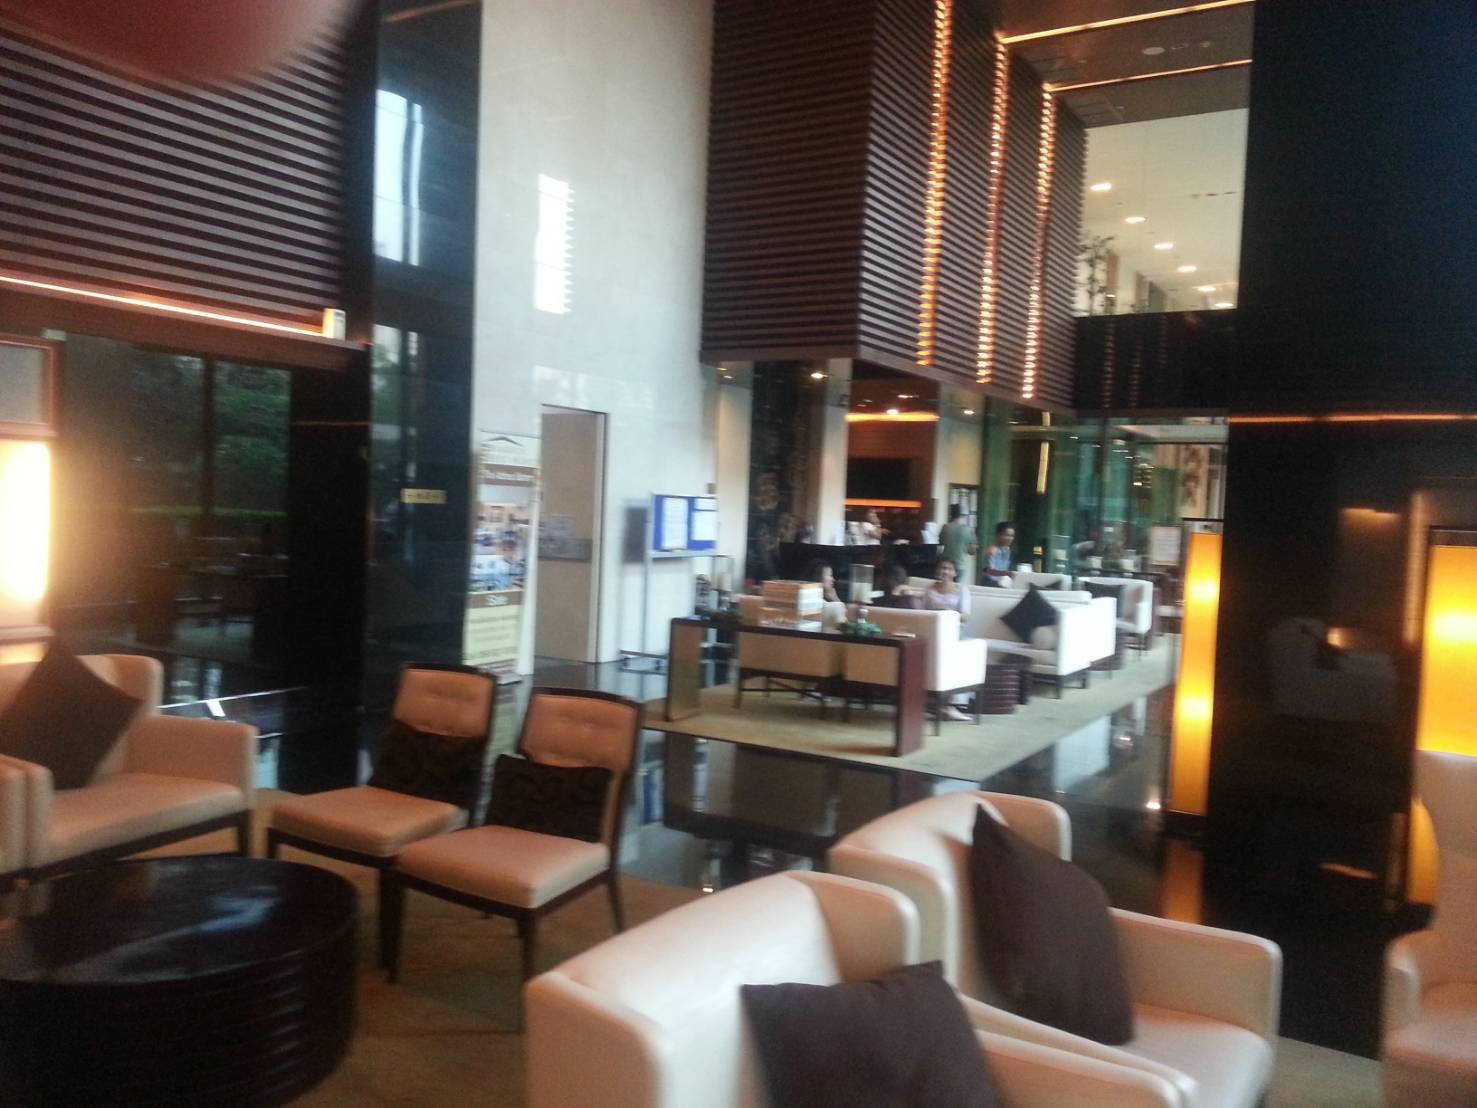 Bangkok Condo Apartment For Rent in Sathorn Chong Nonsi Lovely in Sathorn